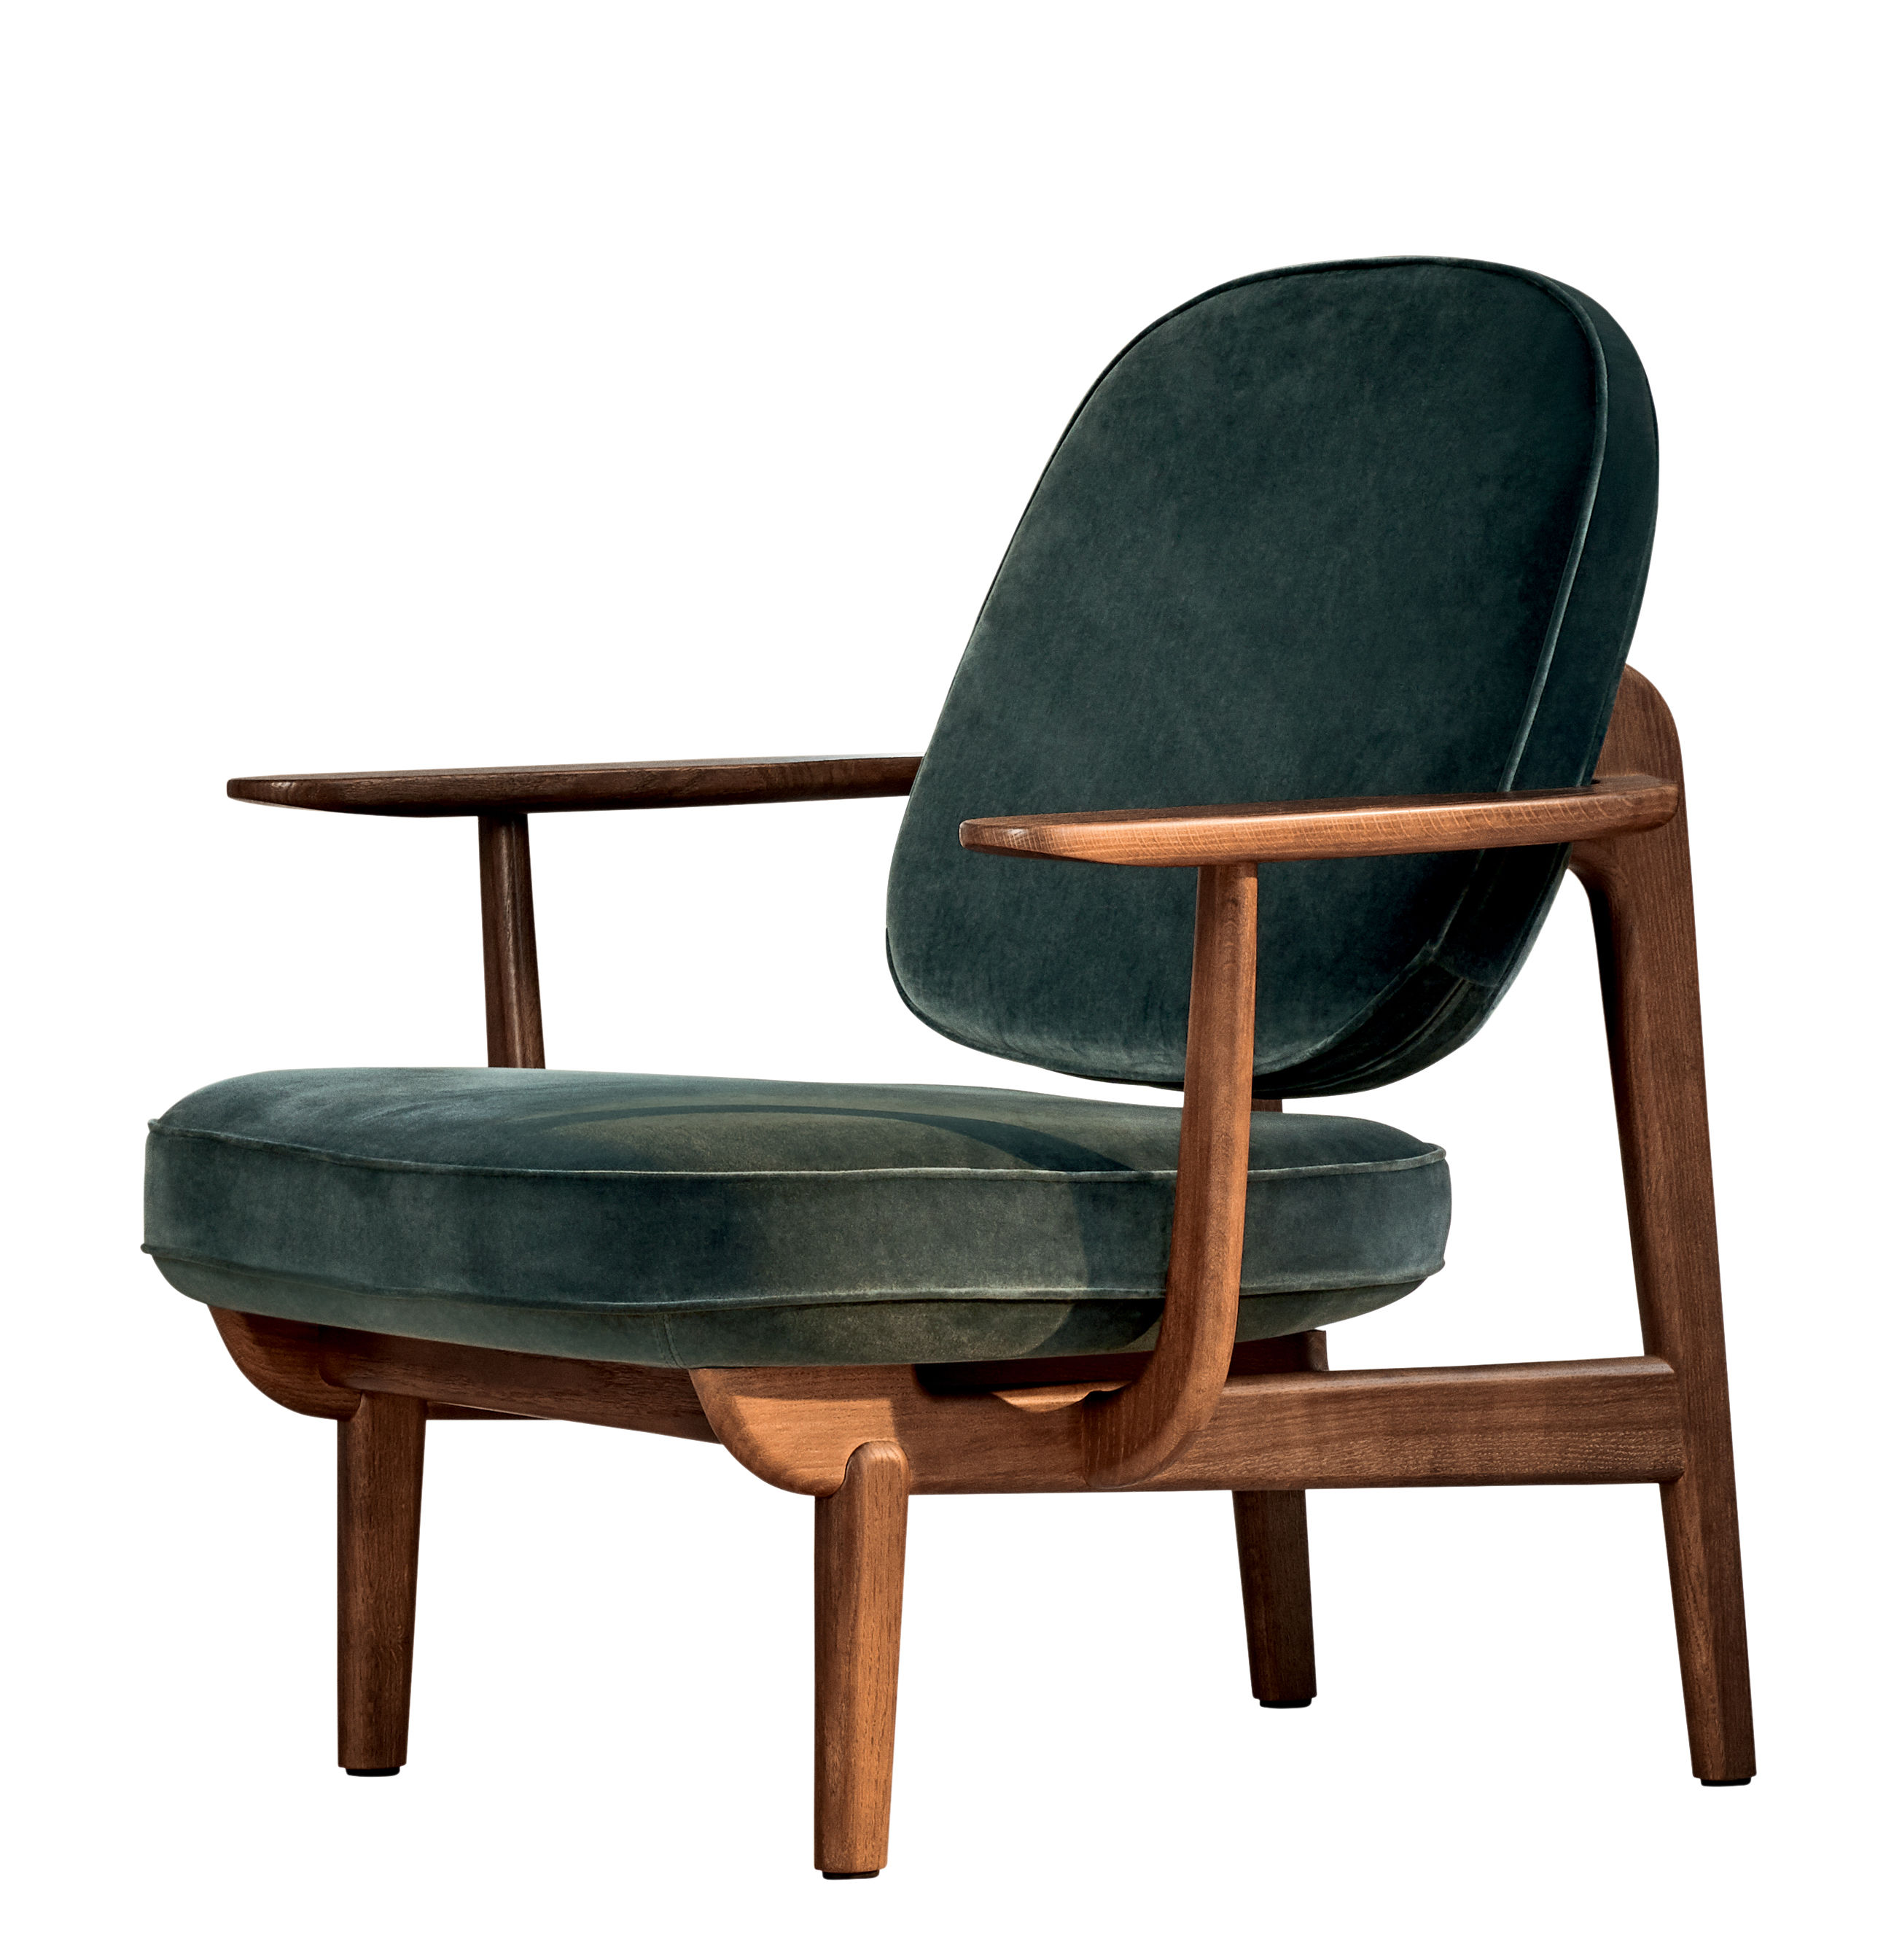 Furniture - Armchairs - JH97 Low armchair - by Jaime Hayon / Fabric by Fritz Hansen - Green / Walnut - Foam, Kvadrat fabric, Tinted oak wood